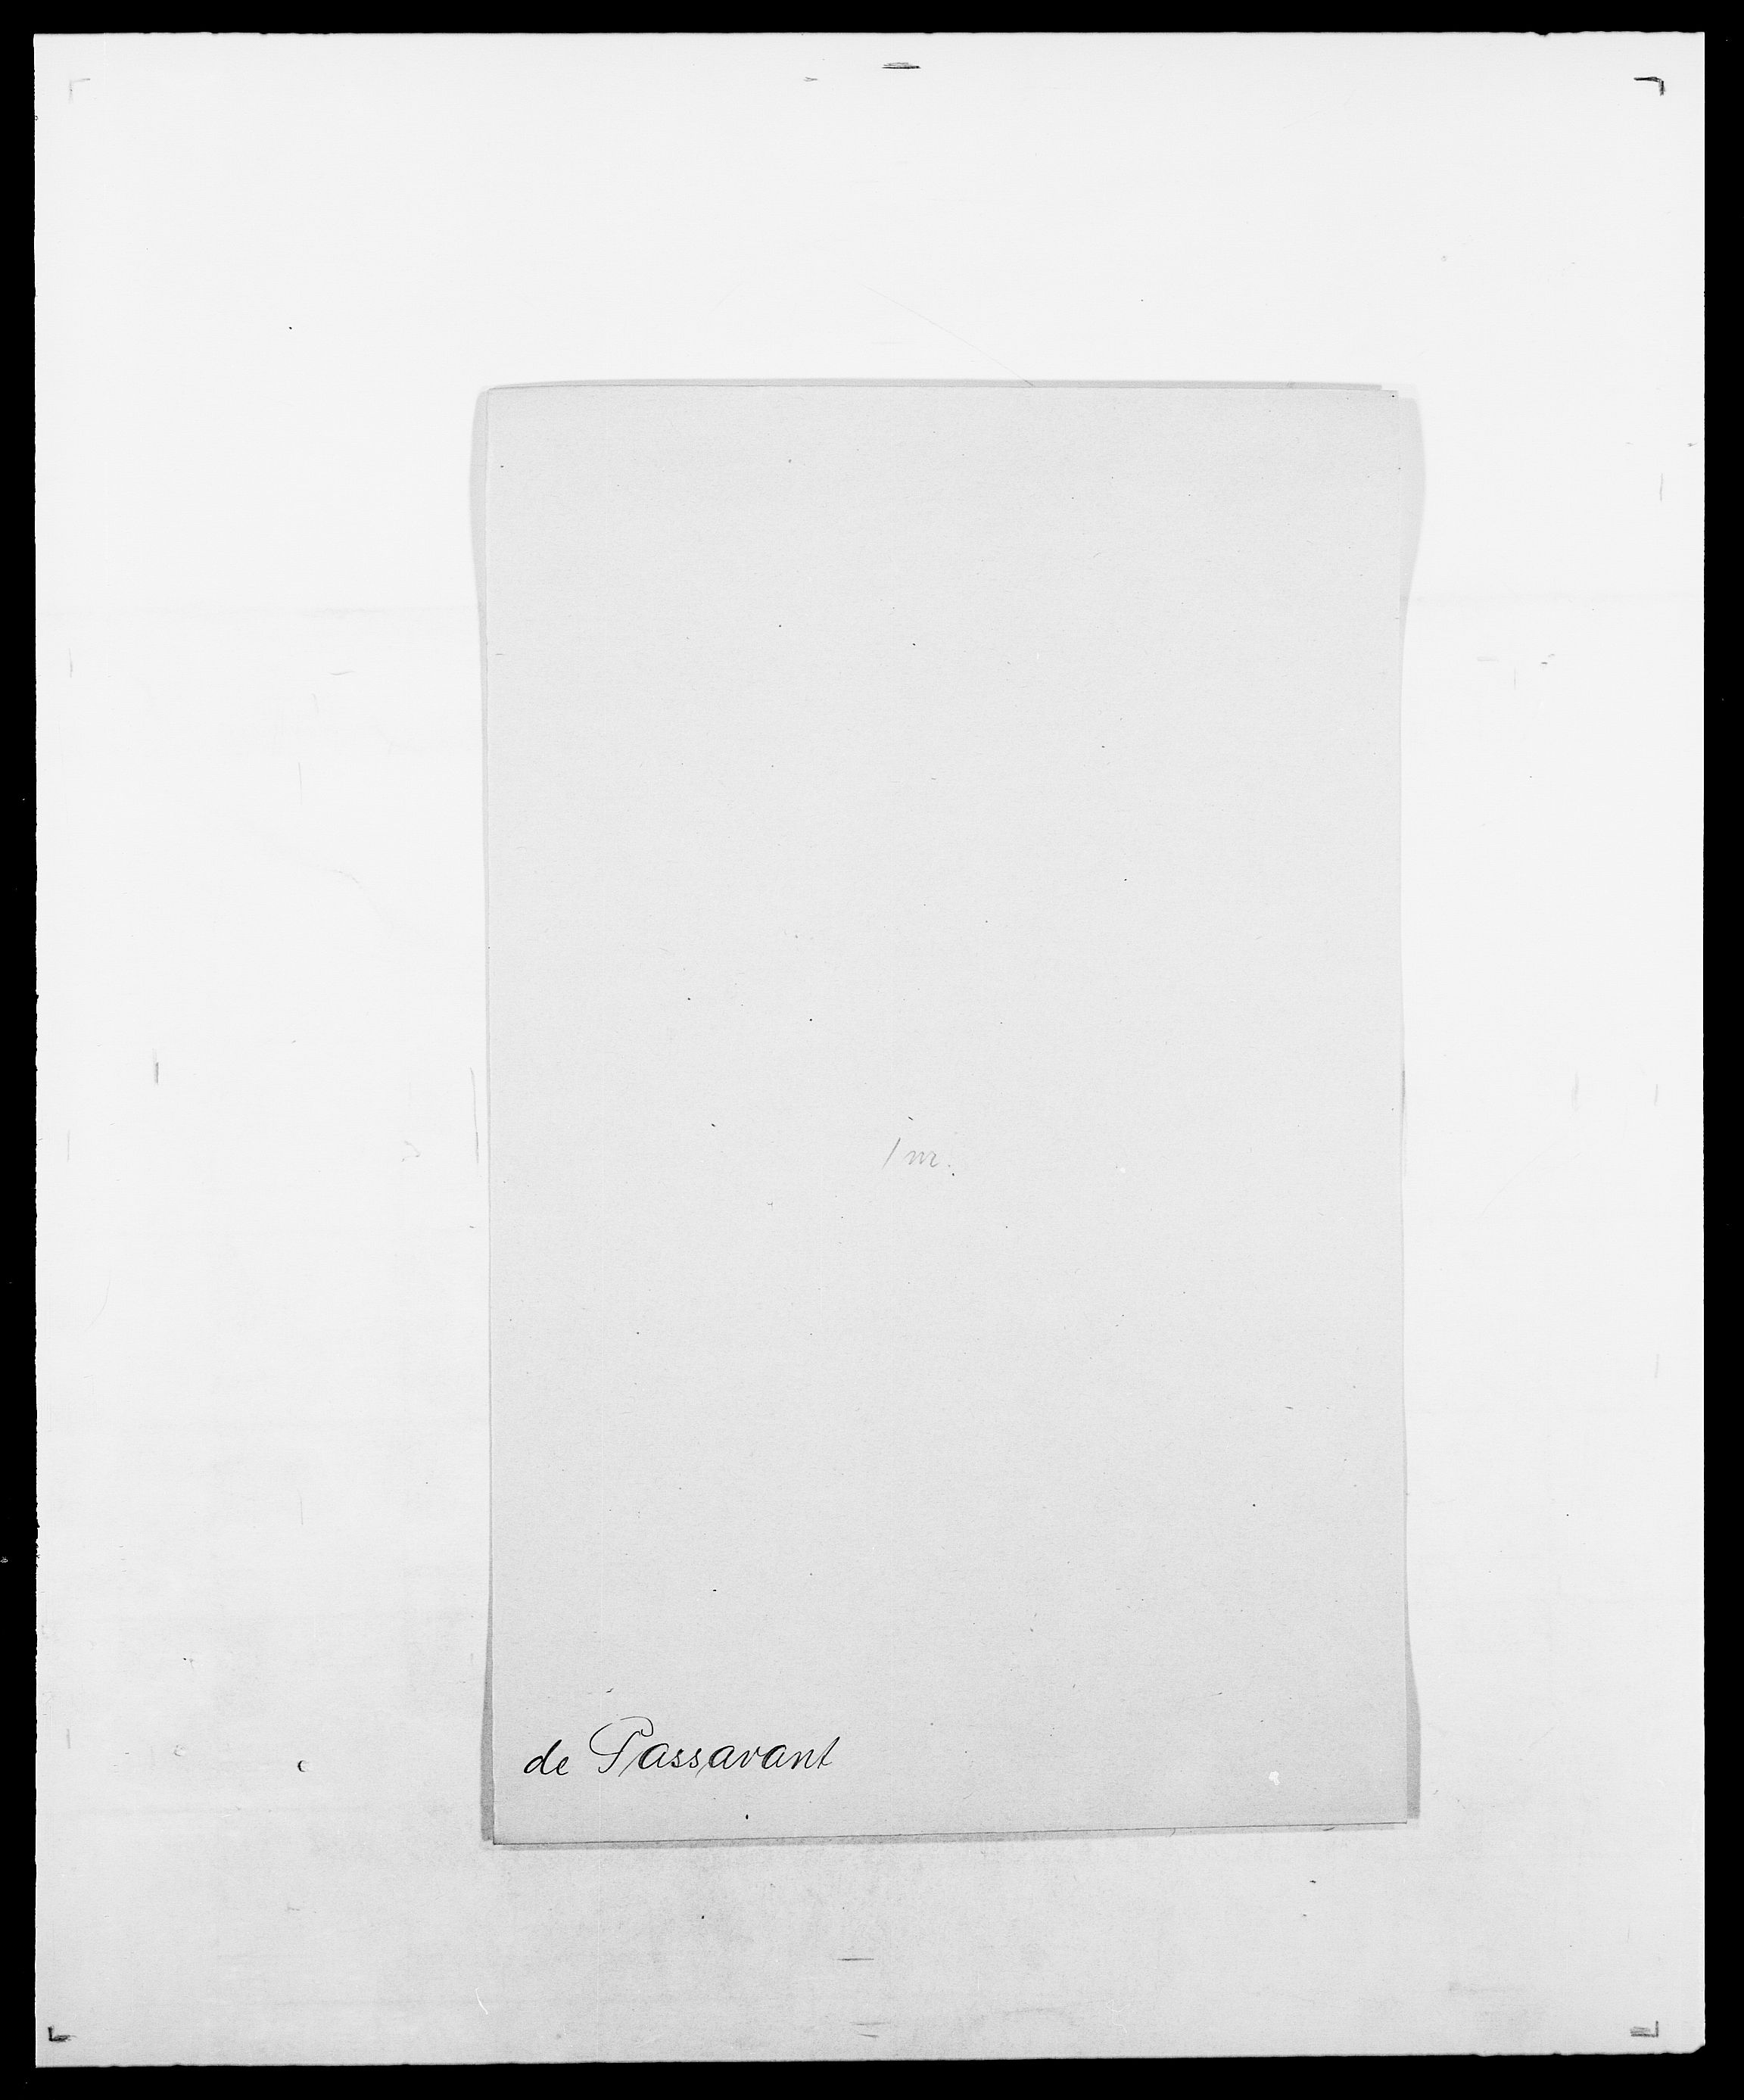 SAO, Delgobe, Charles Antoine - samling, D/Da/L0030: Paars - Pittelkov, s. 143